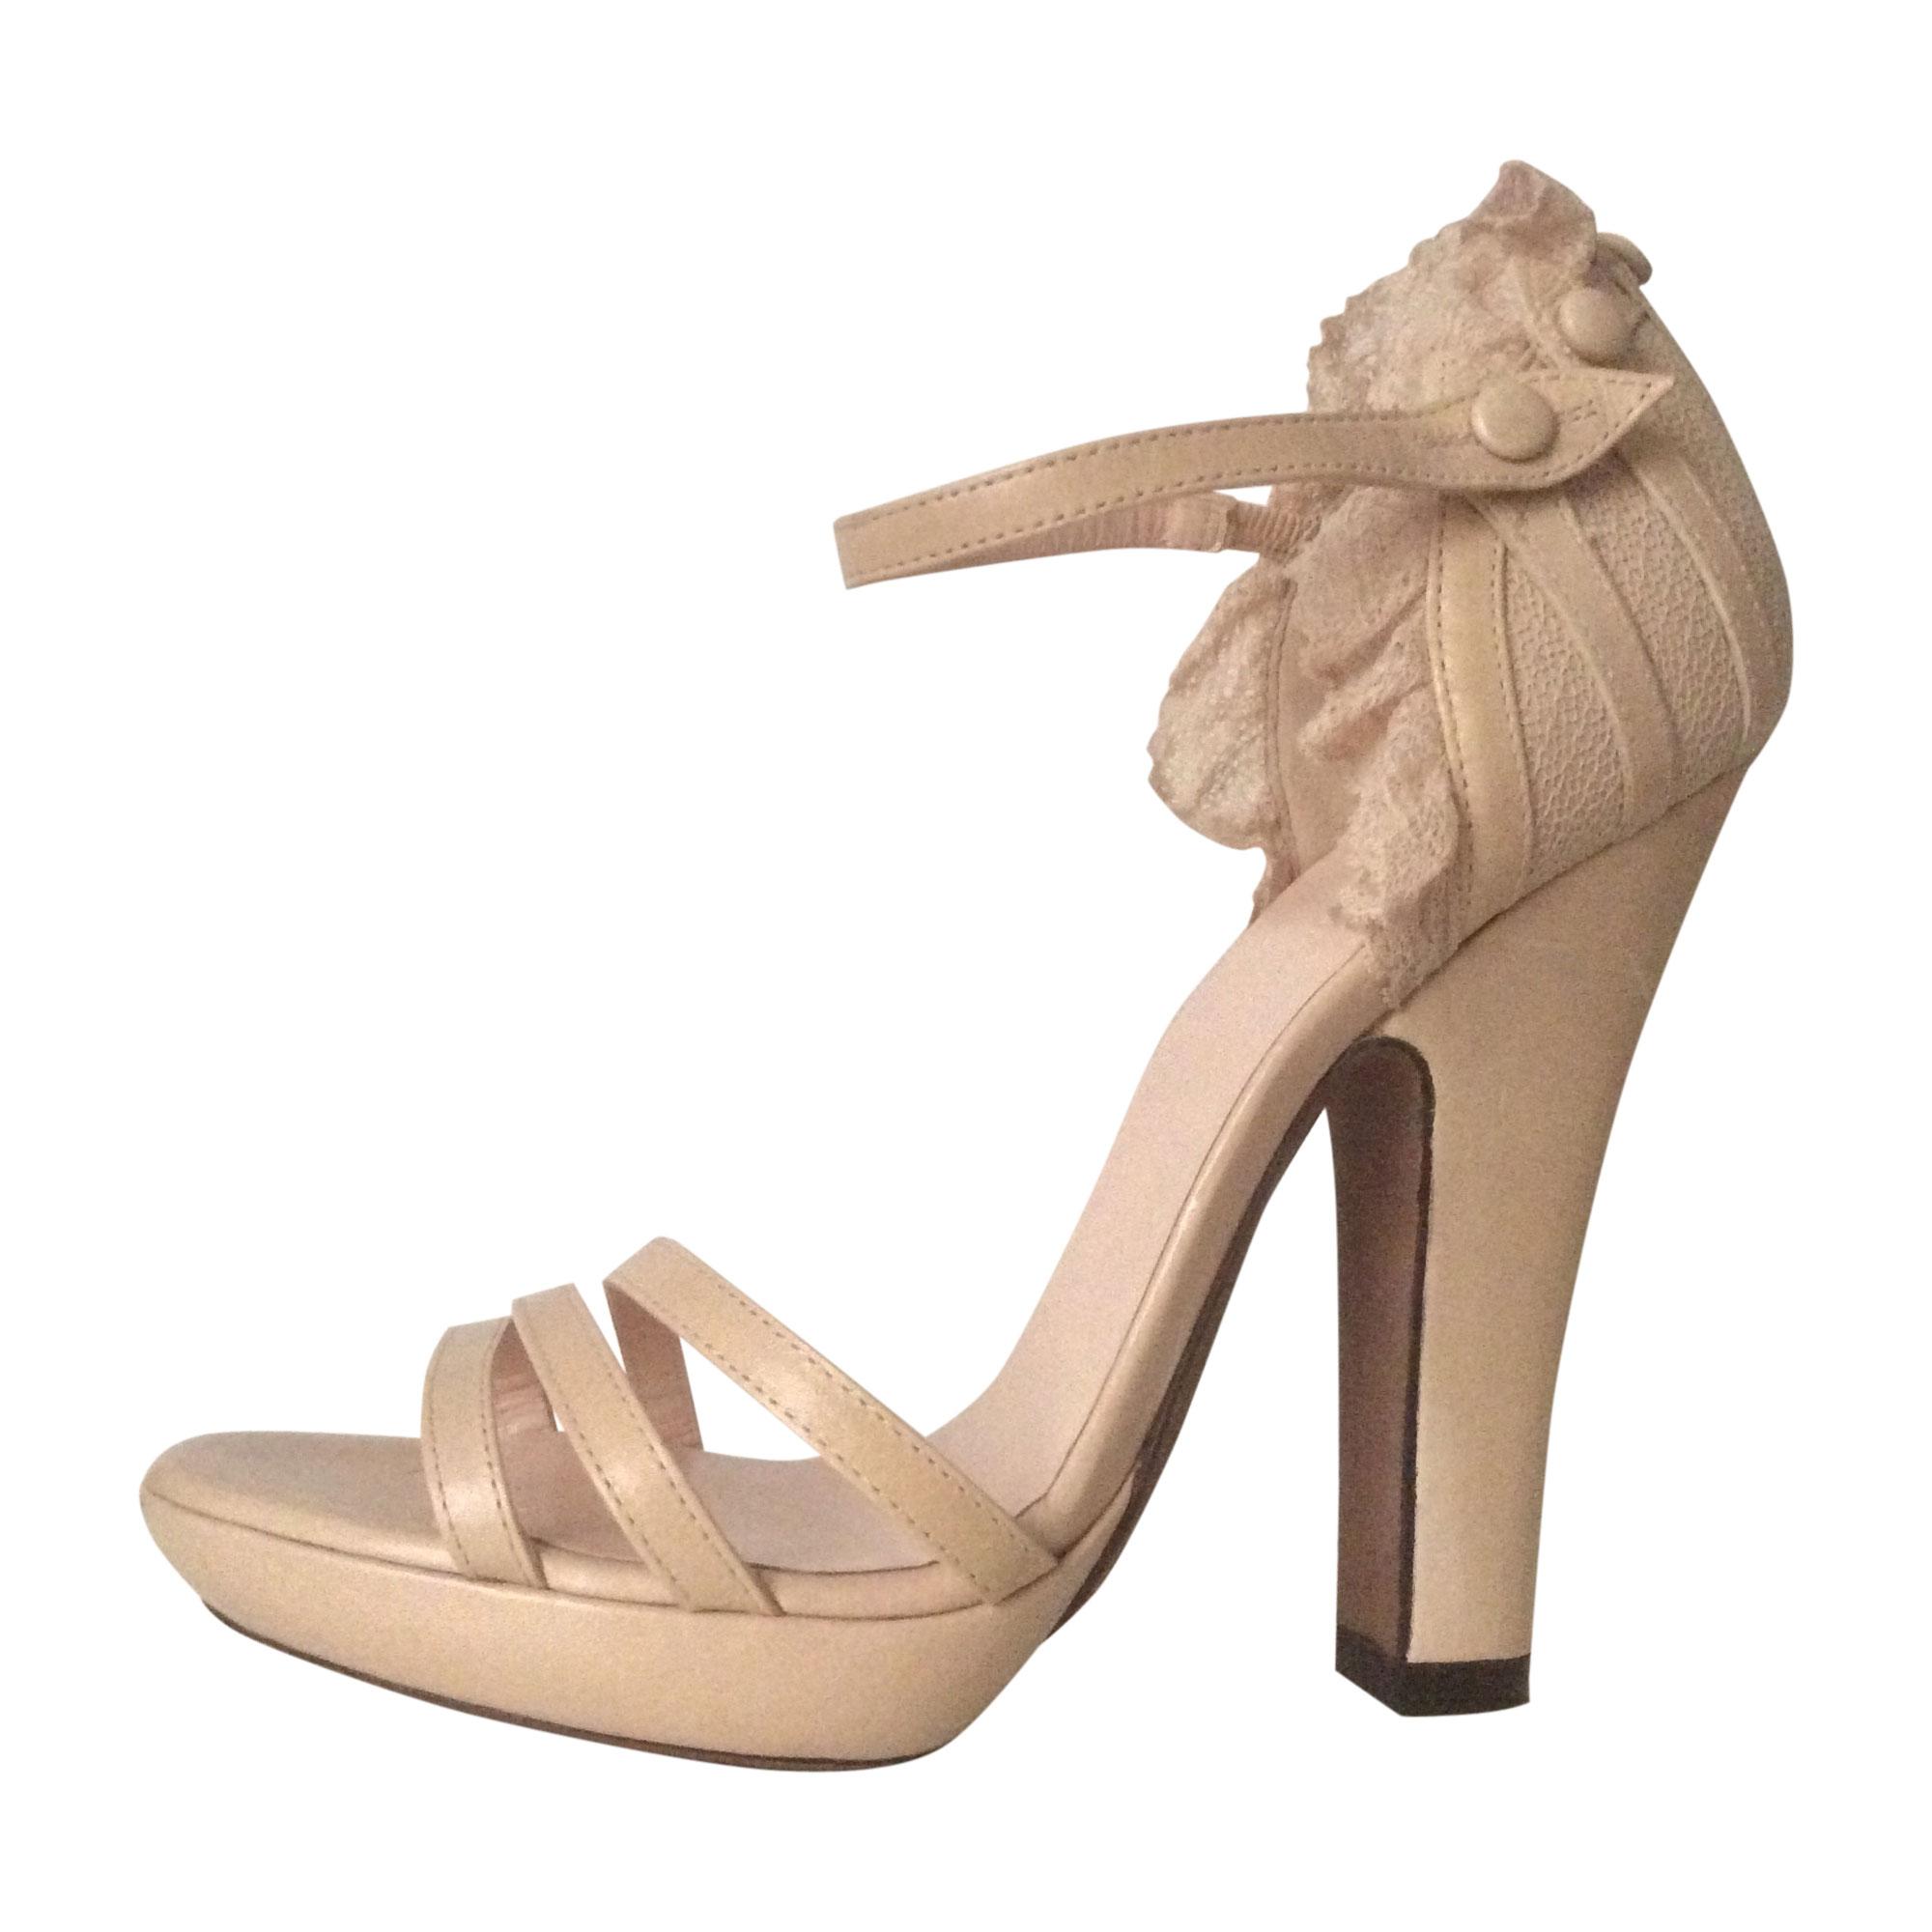 Sandales à talons NINA RICCI Beige, camel